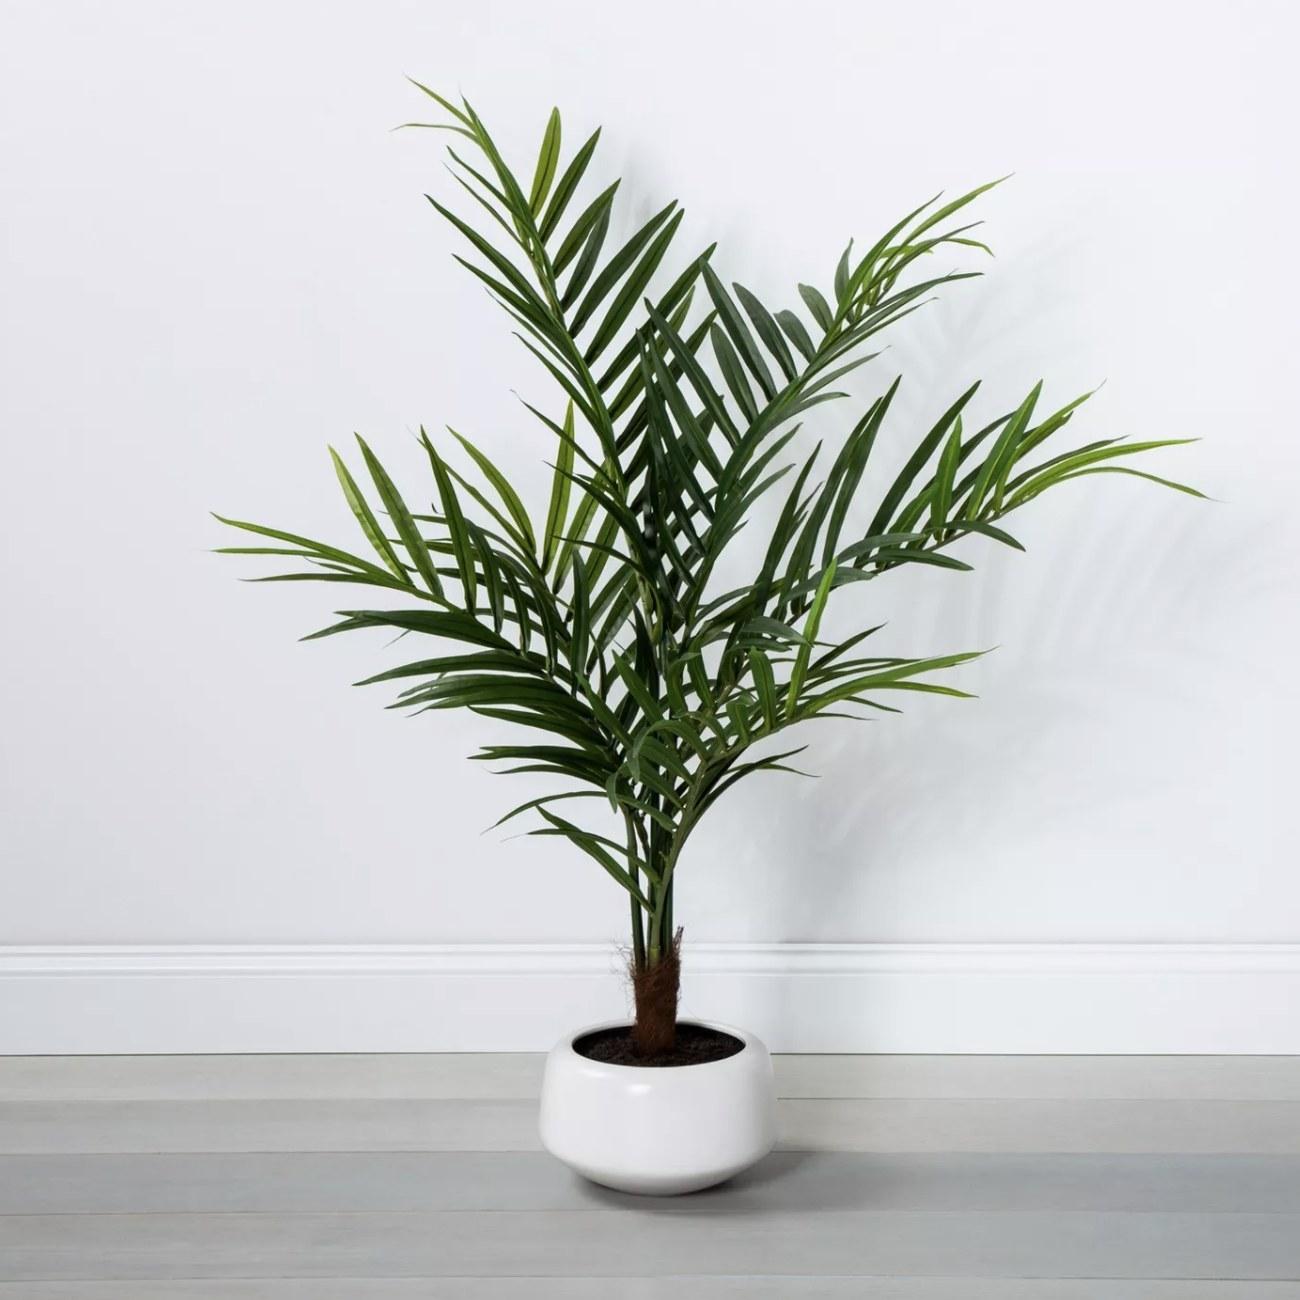 An artificial palm plant